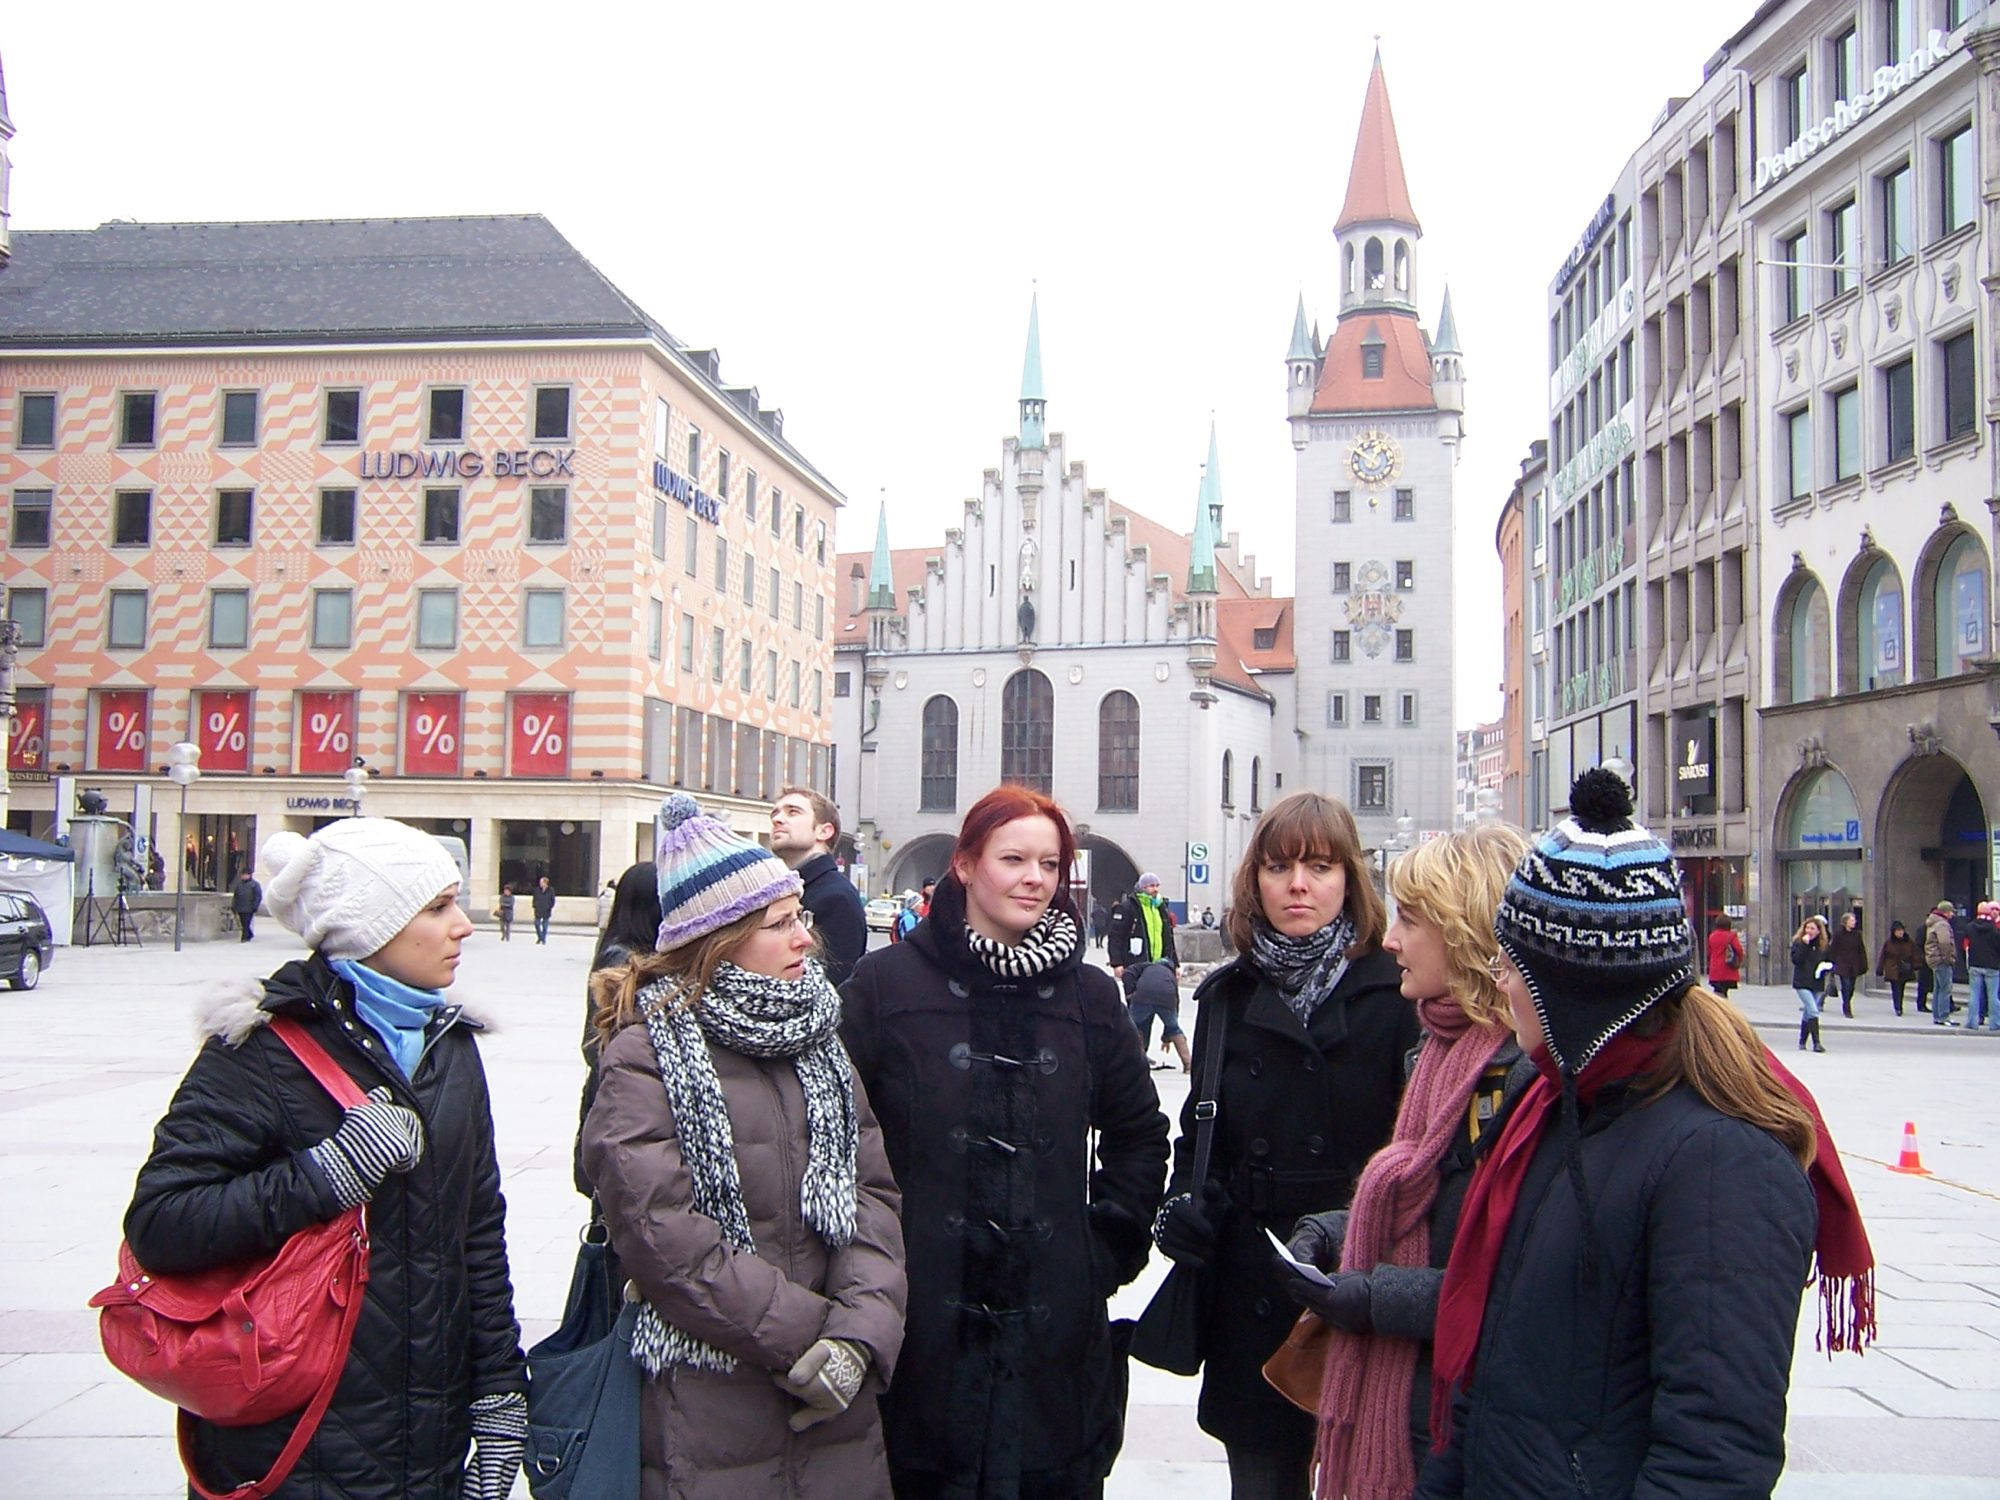 2010 - Cousinentreffen